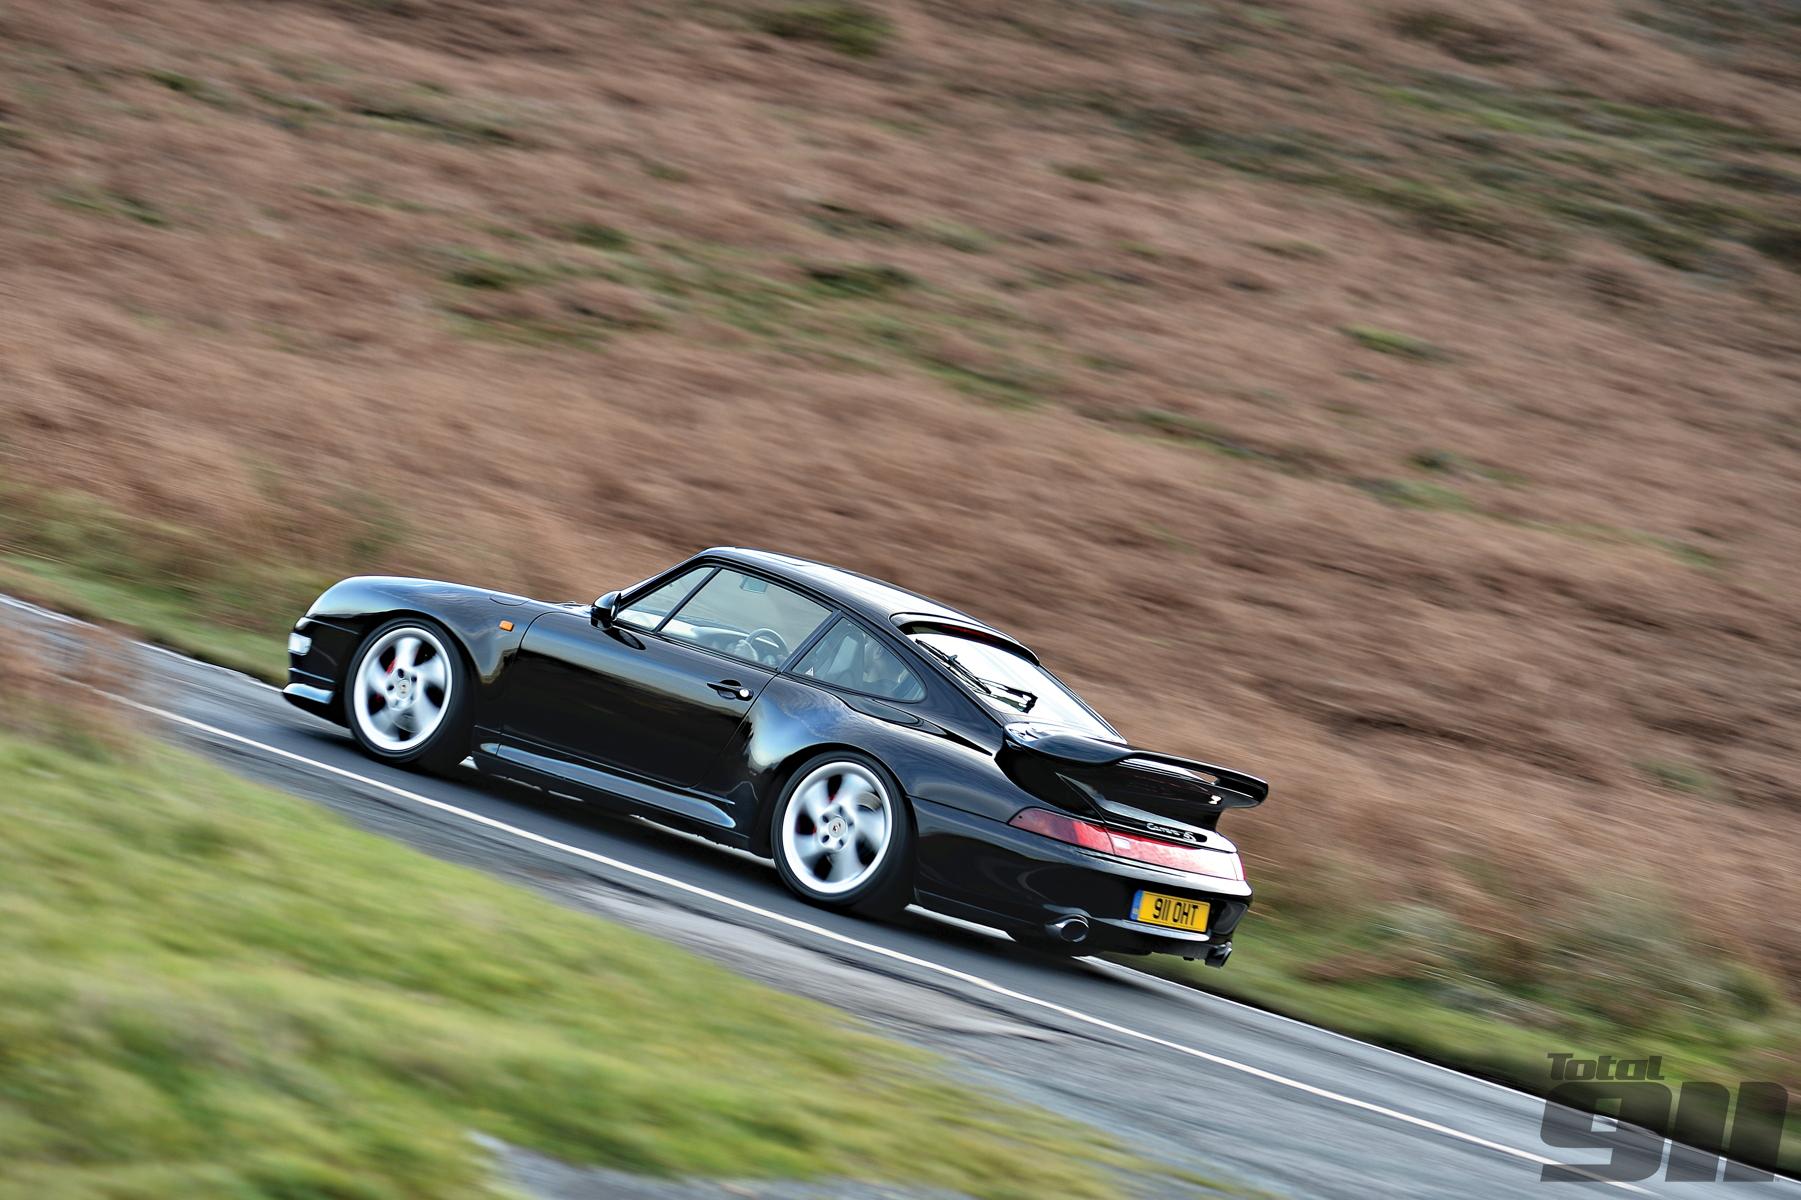 Porsche 993 C4S driving